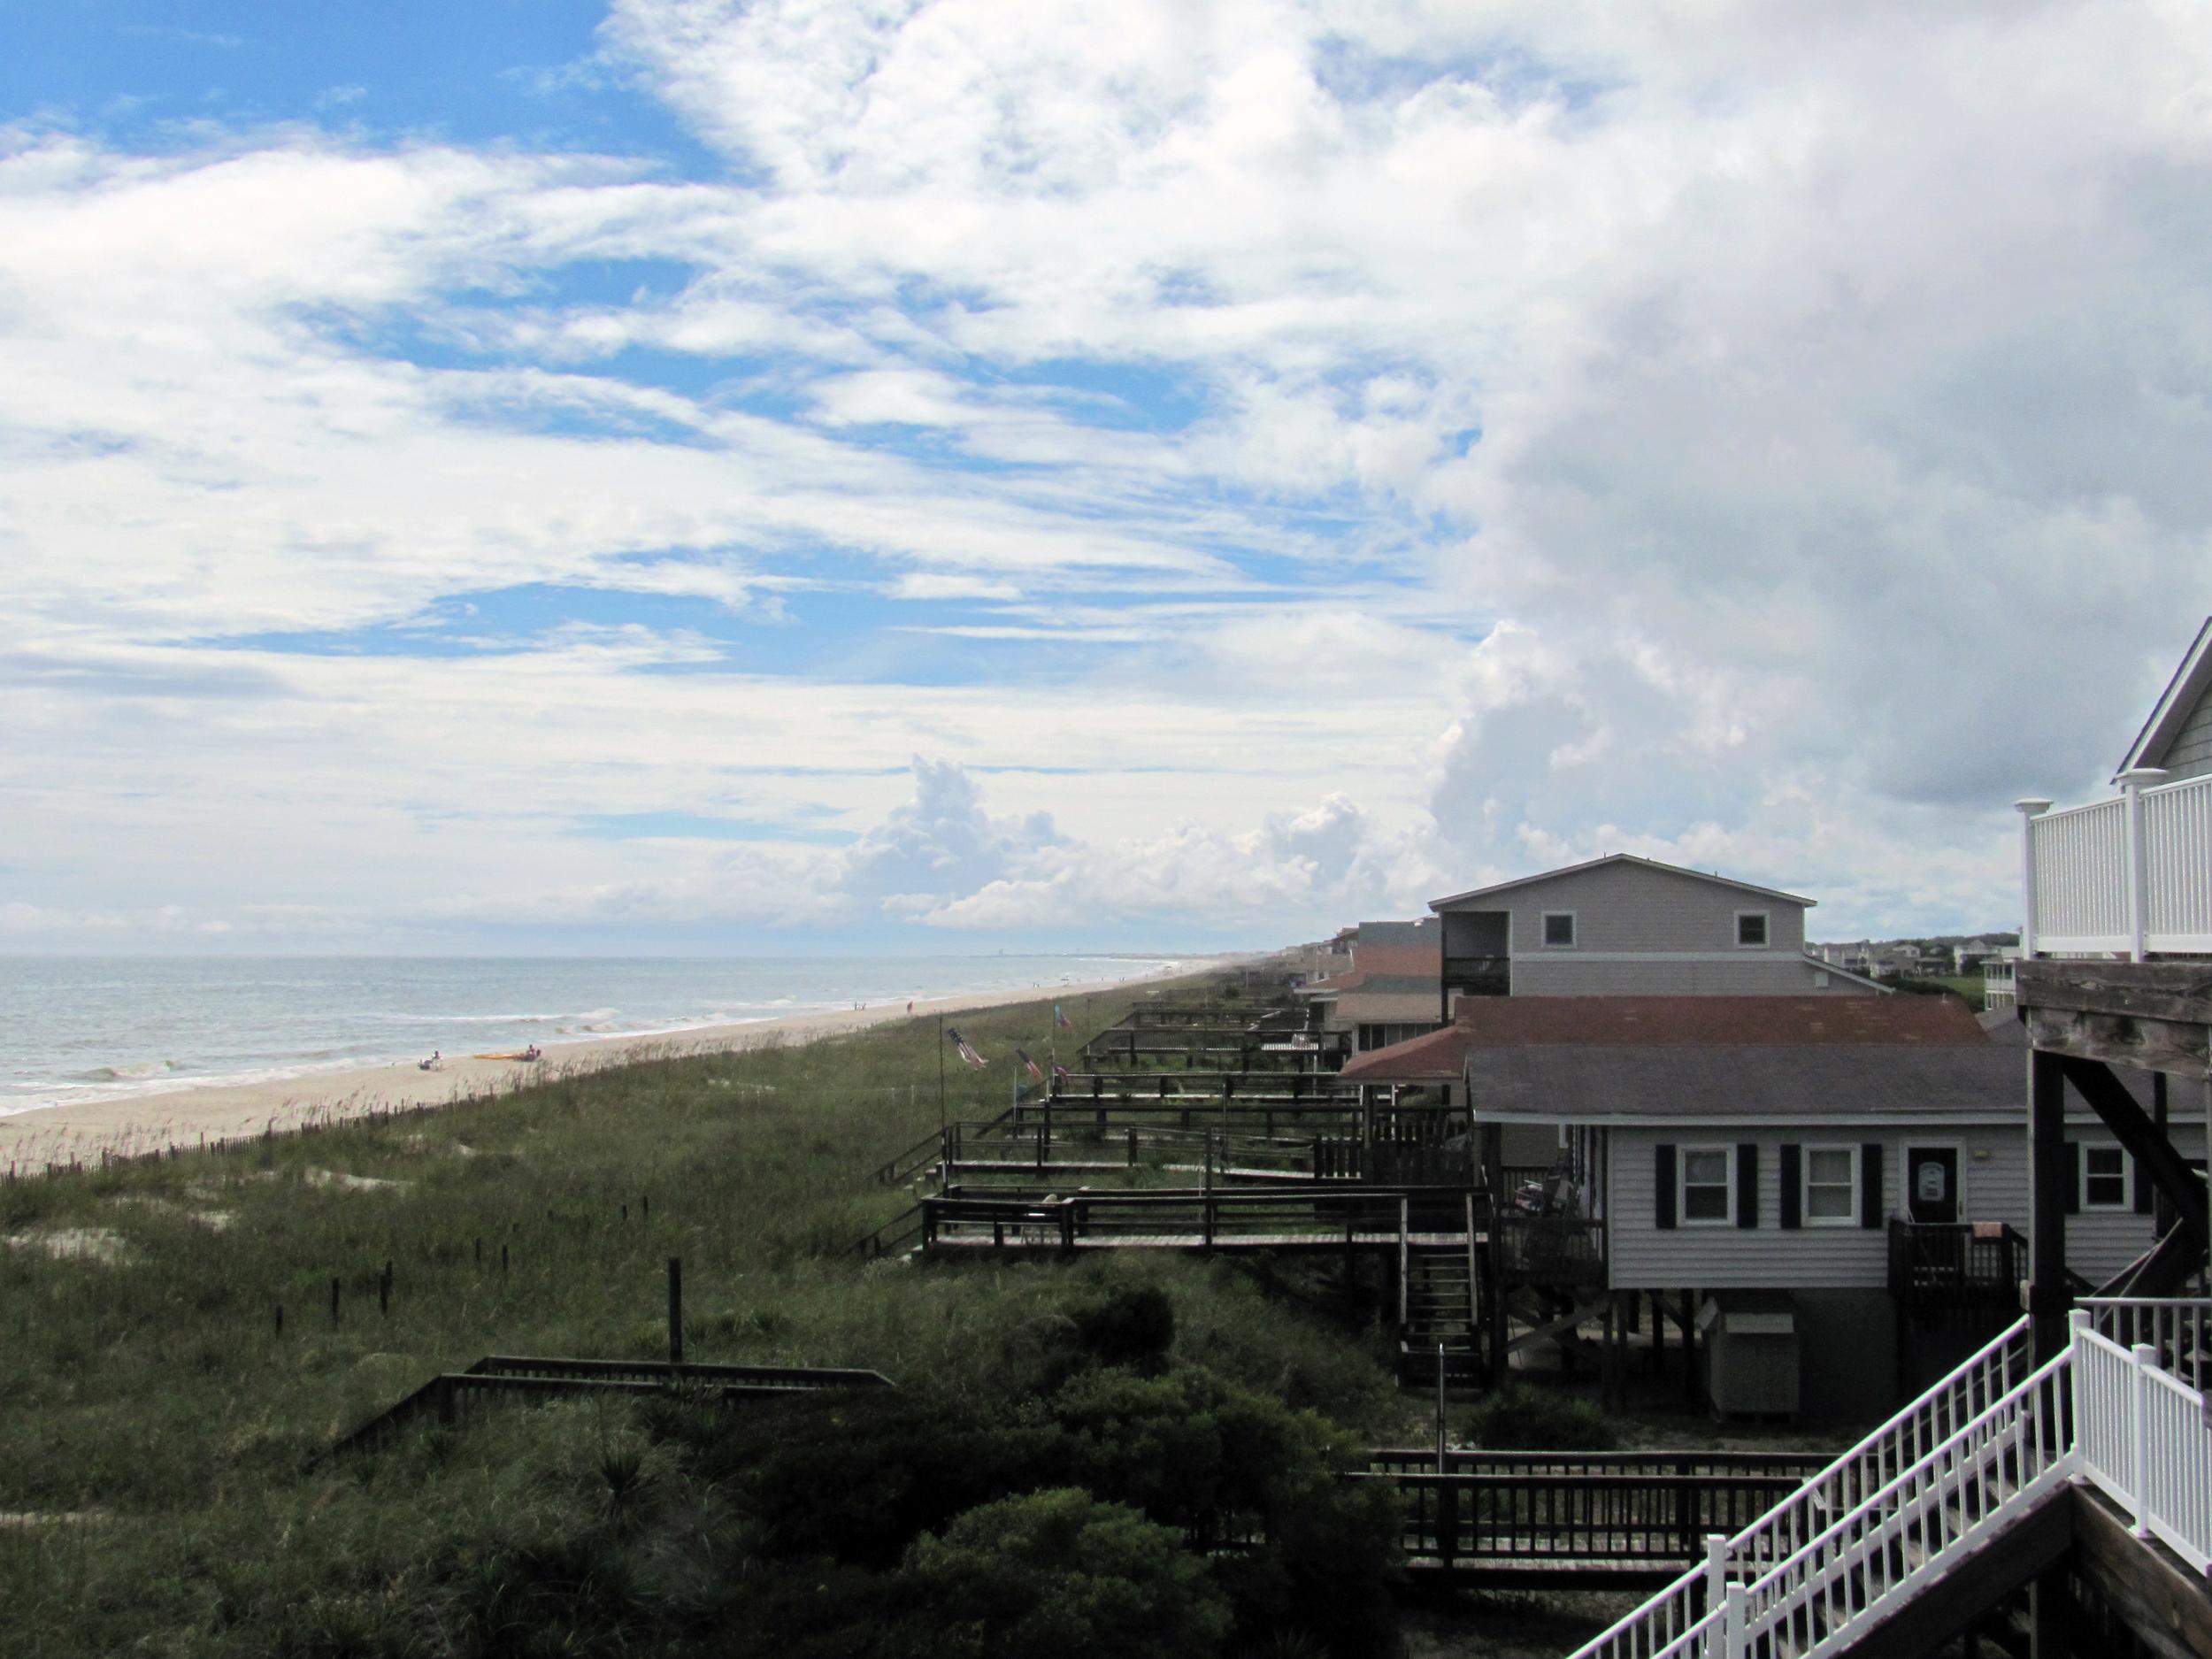 Holden Beach, August 2013